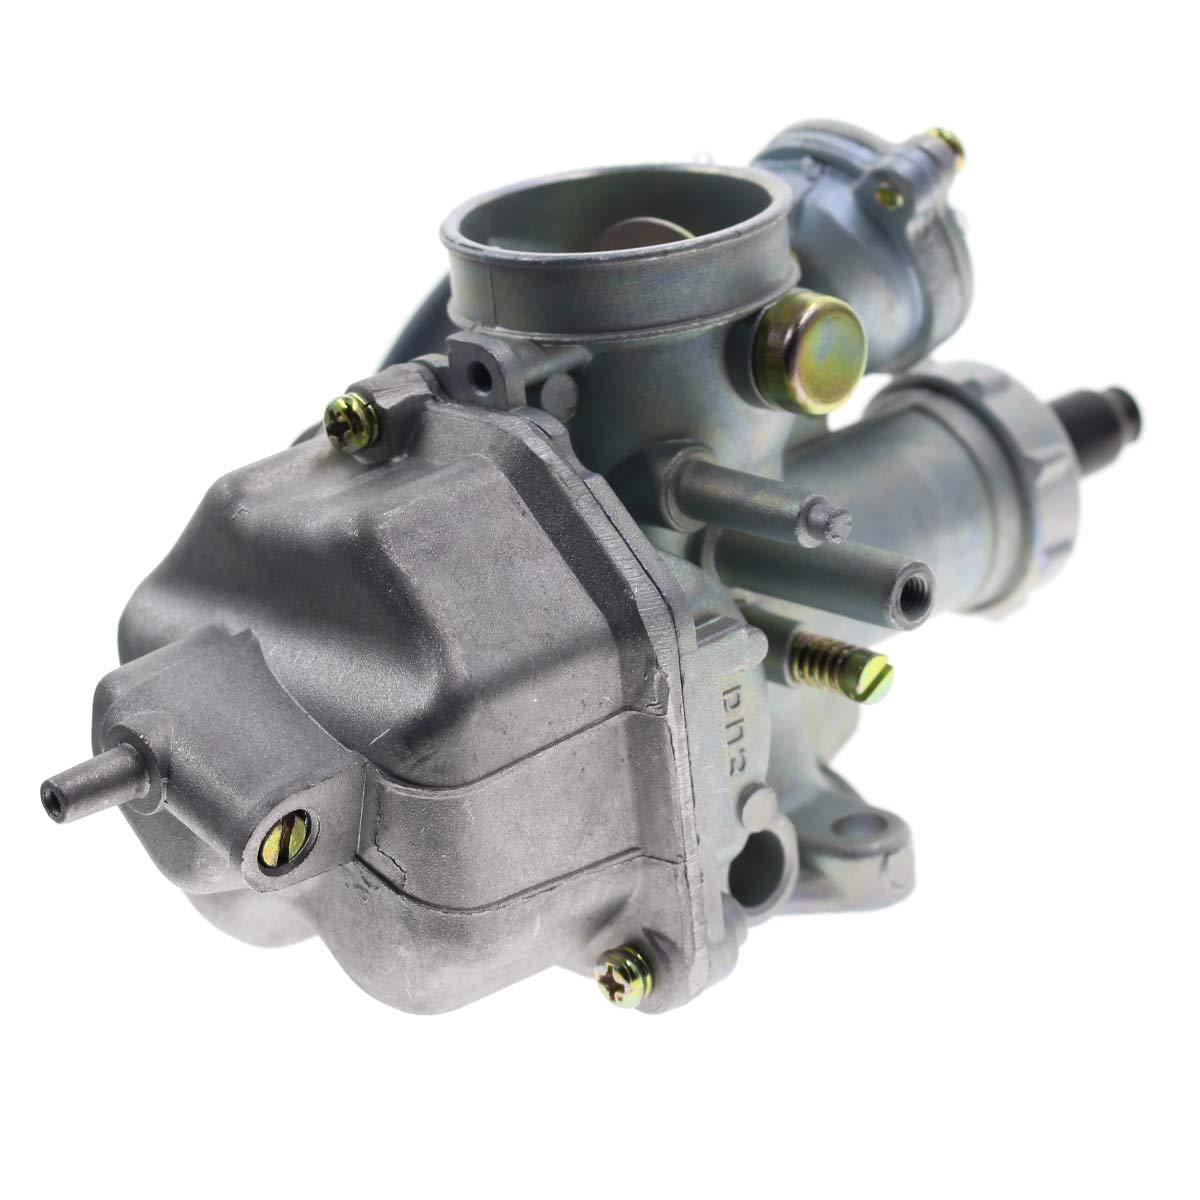 Carbhub TRX250TE Carburetor for Honda TRX250 Recon 1997-2001 TRX250 Recon Carburetor Honda TRX250TE Fourtrax ES 2002-2007 Honda TRX250TM Fourtrax Recon 2002-2007